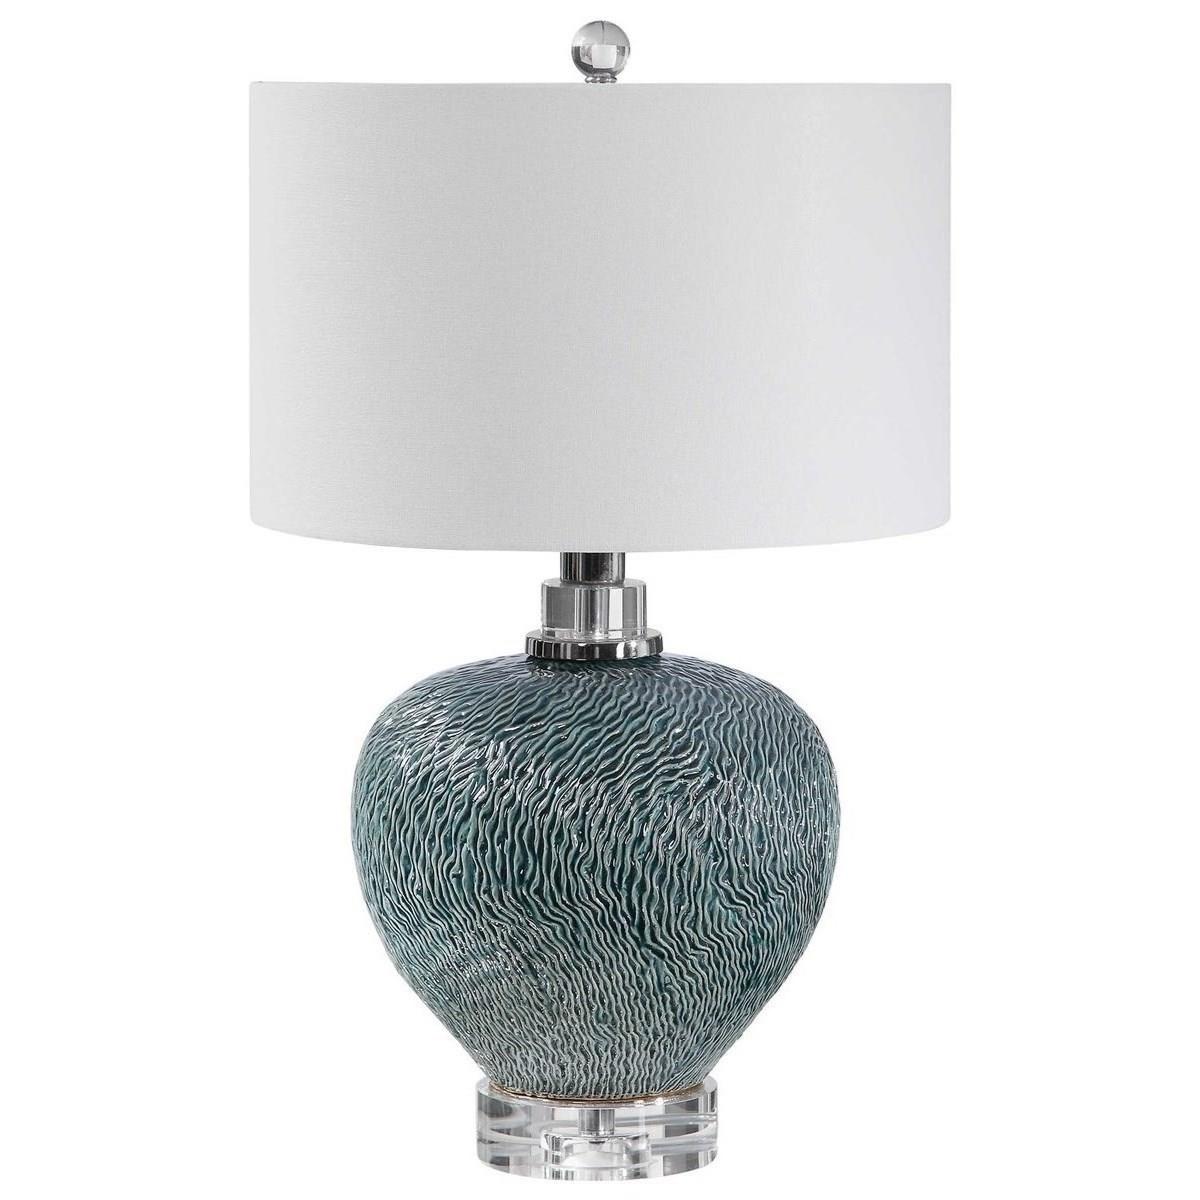 Almera Dark Teal Table Lamp